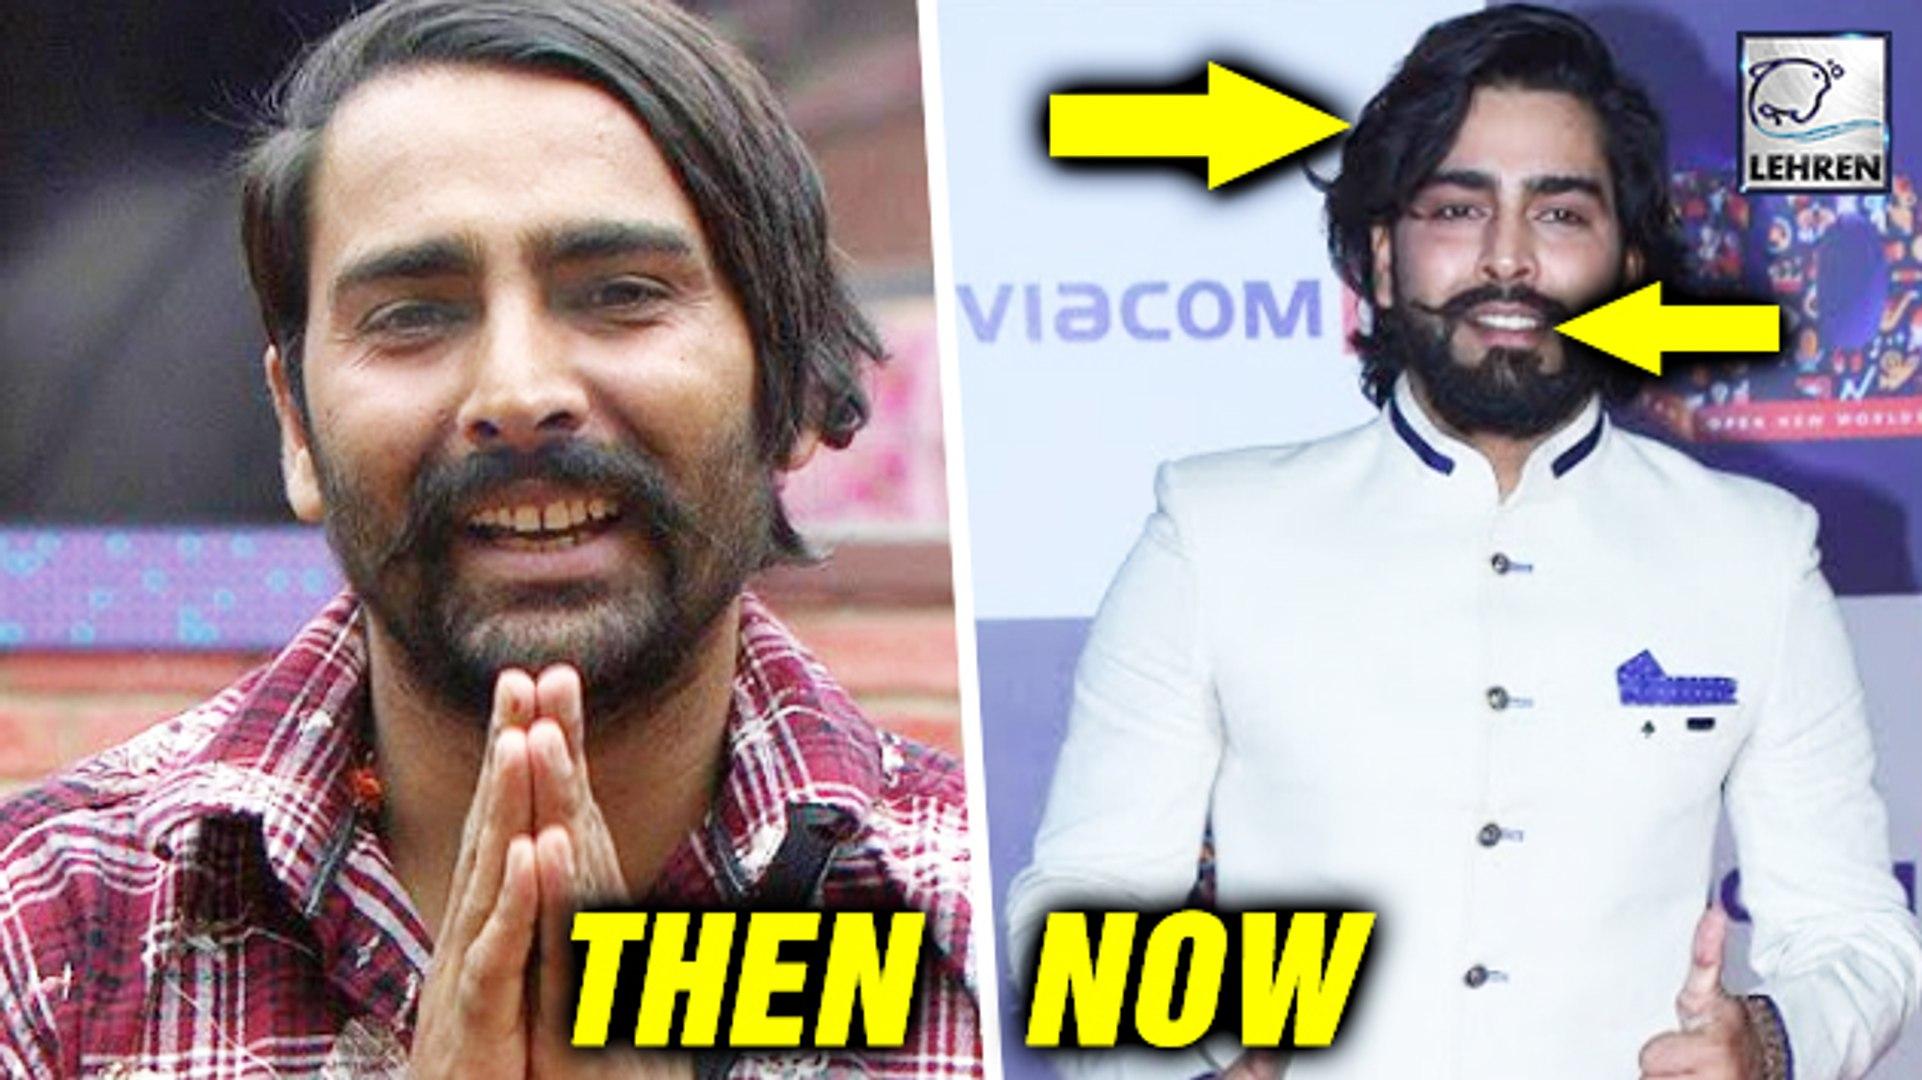 Bigg Boss 10 Contestant Manveer Gurjar's Amazing Transformation